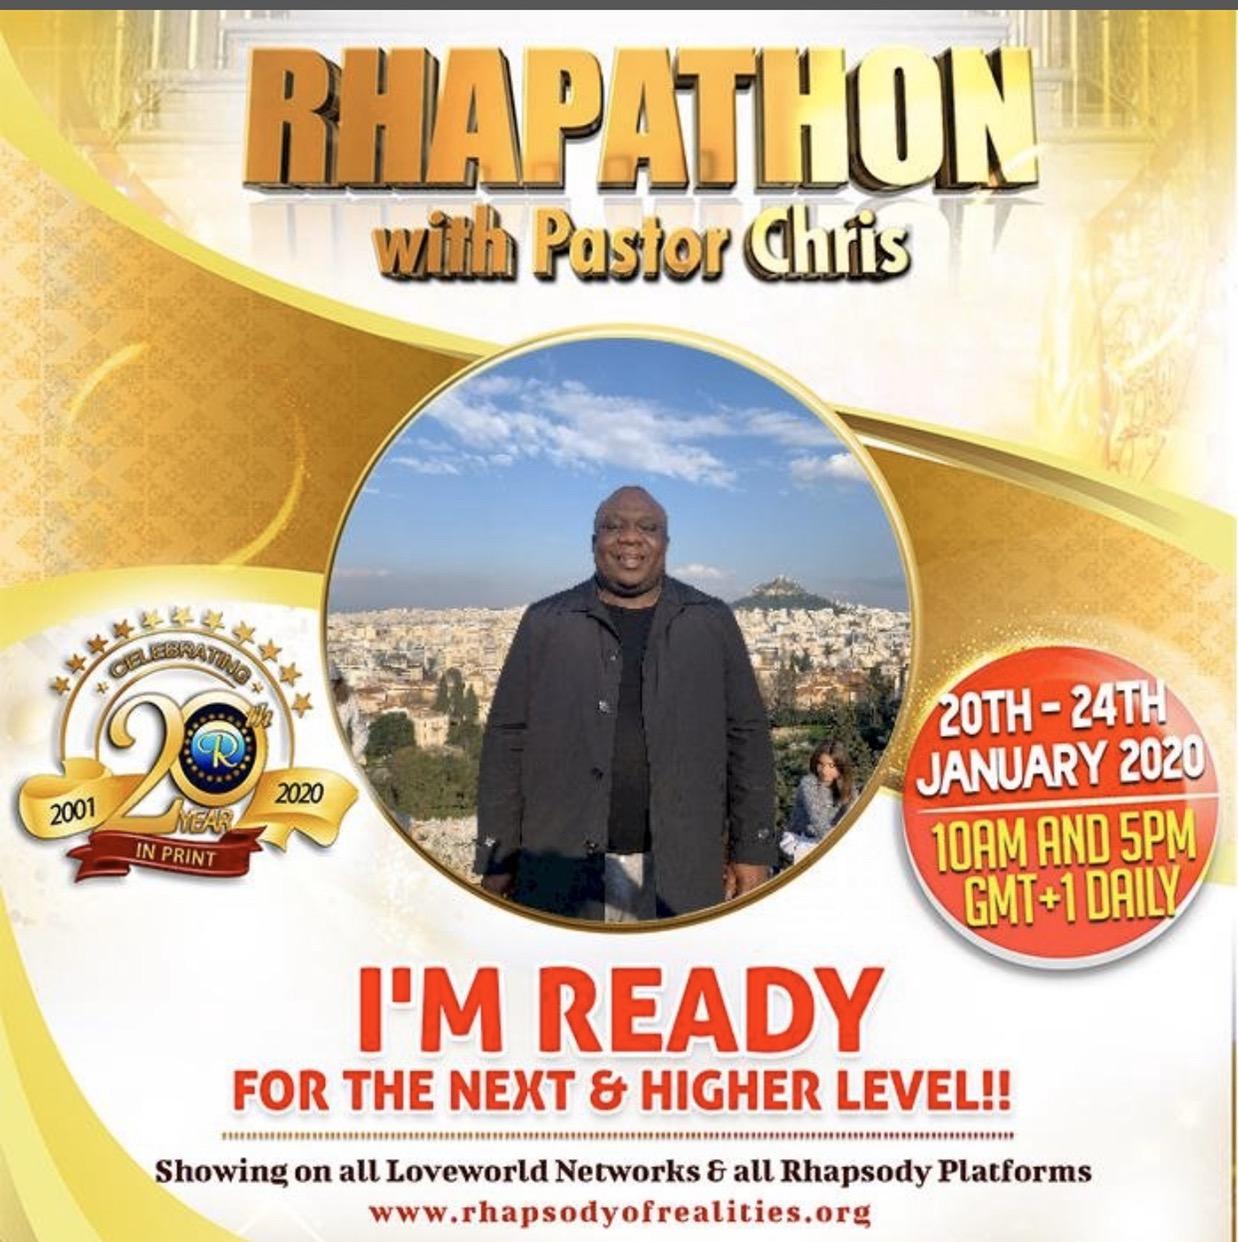 We are ready. #EER #Rhapathon2020